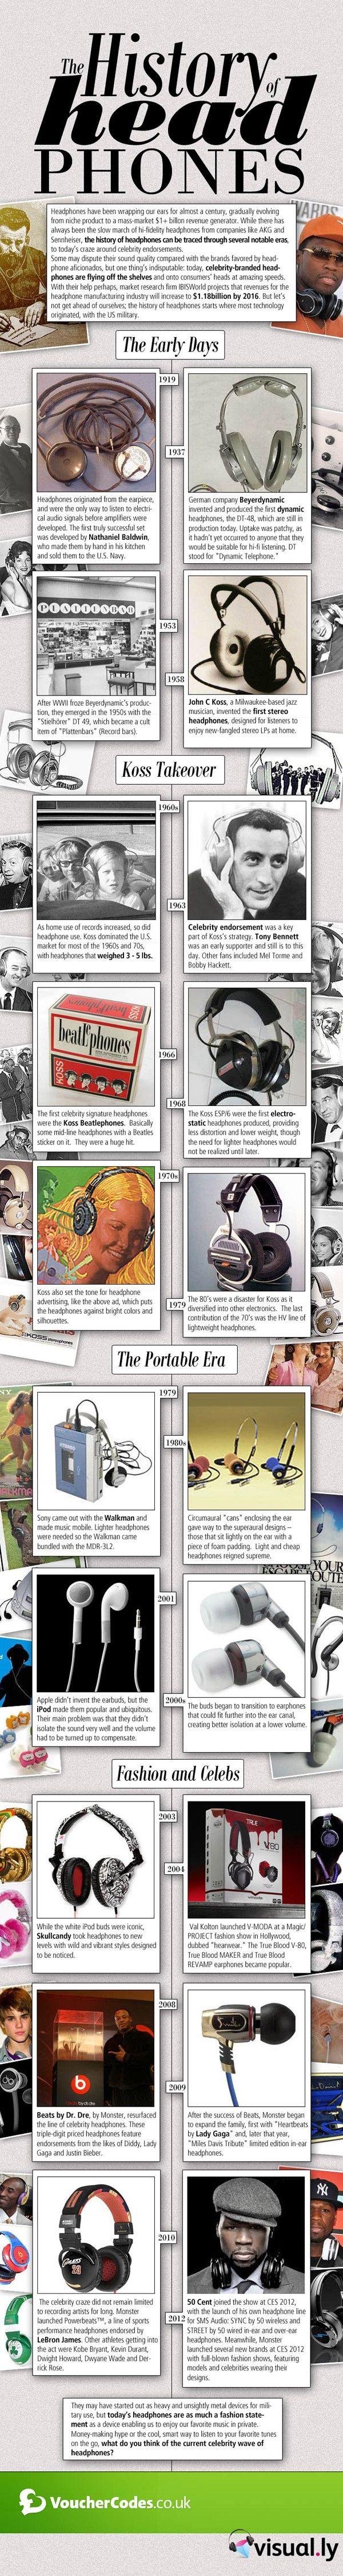 Història dels auriculars - The History of headphones -